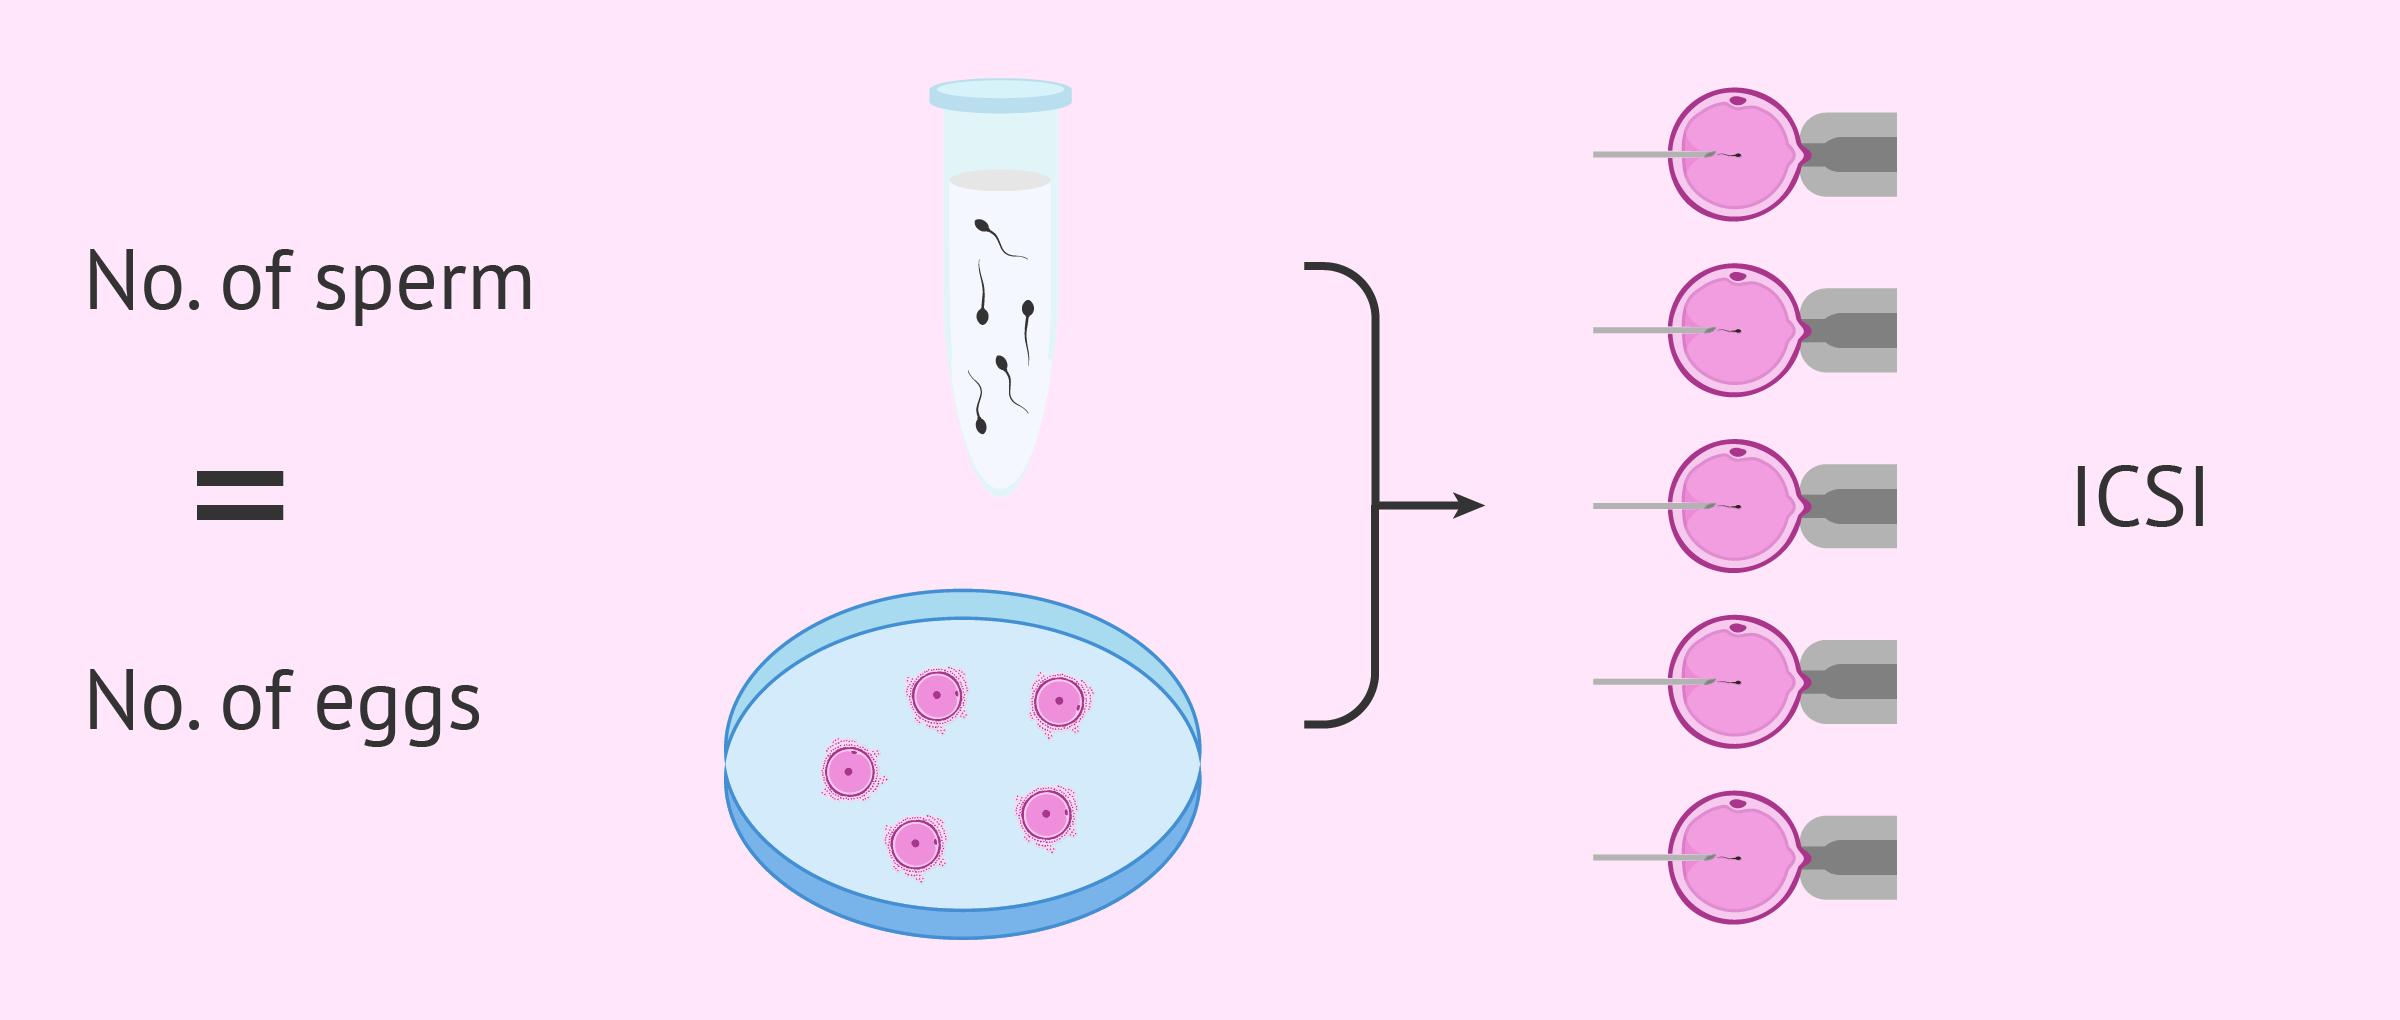 Treating cryptozoospermia with ICSI